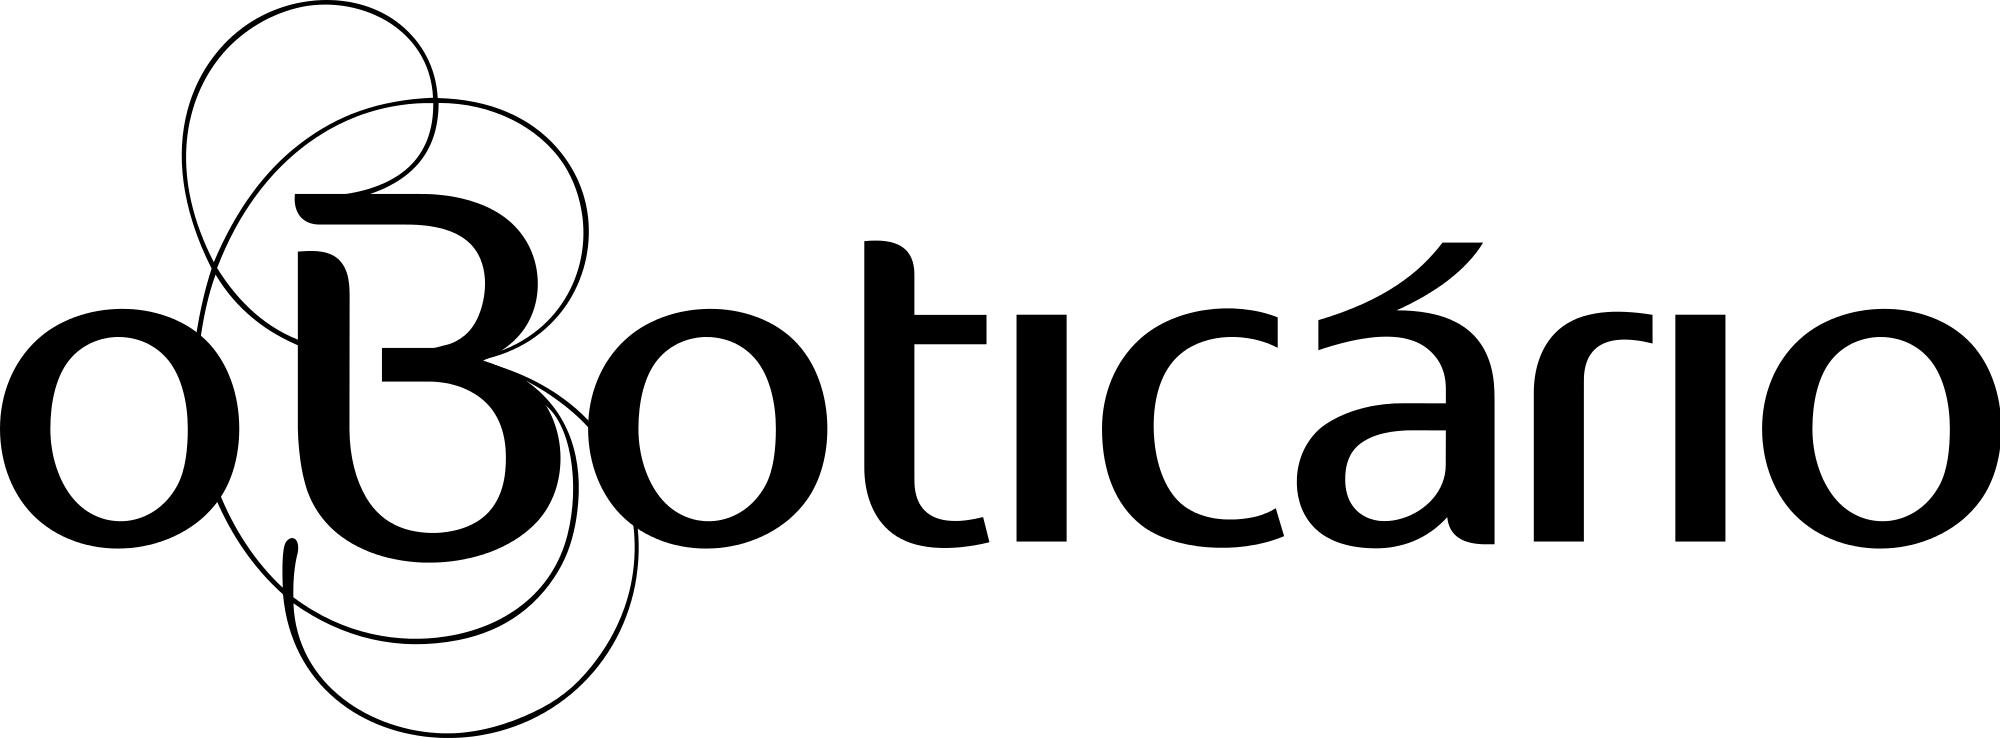 Exclusive Coupon Codes at Official Website of Boticário Revendedora